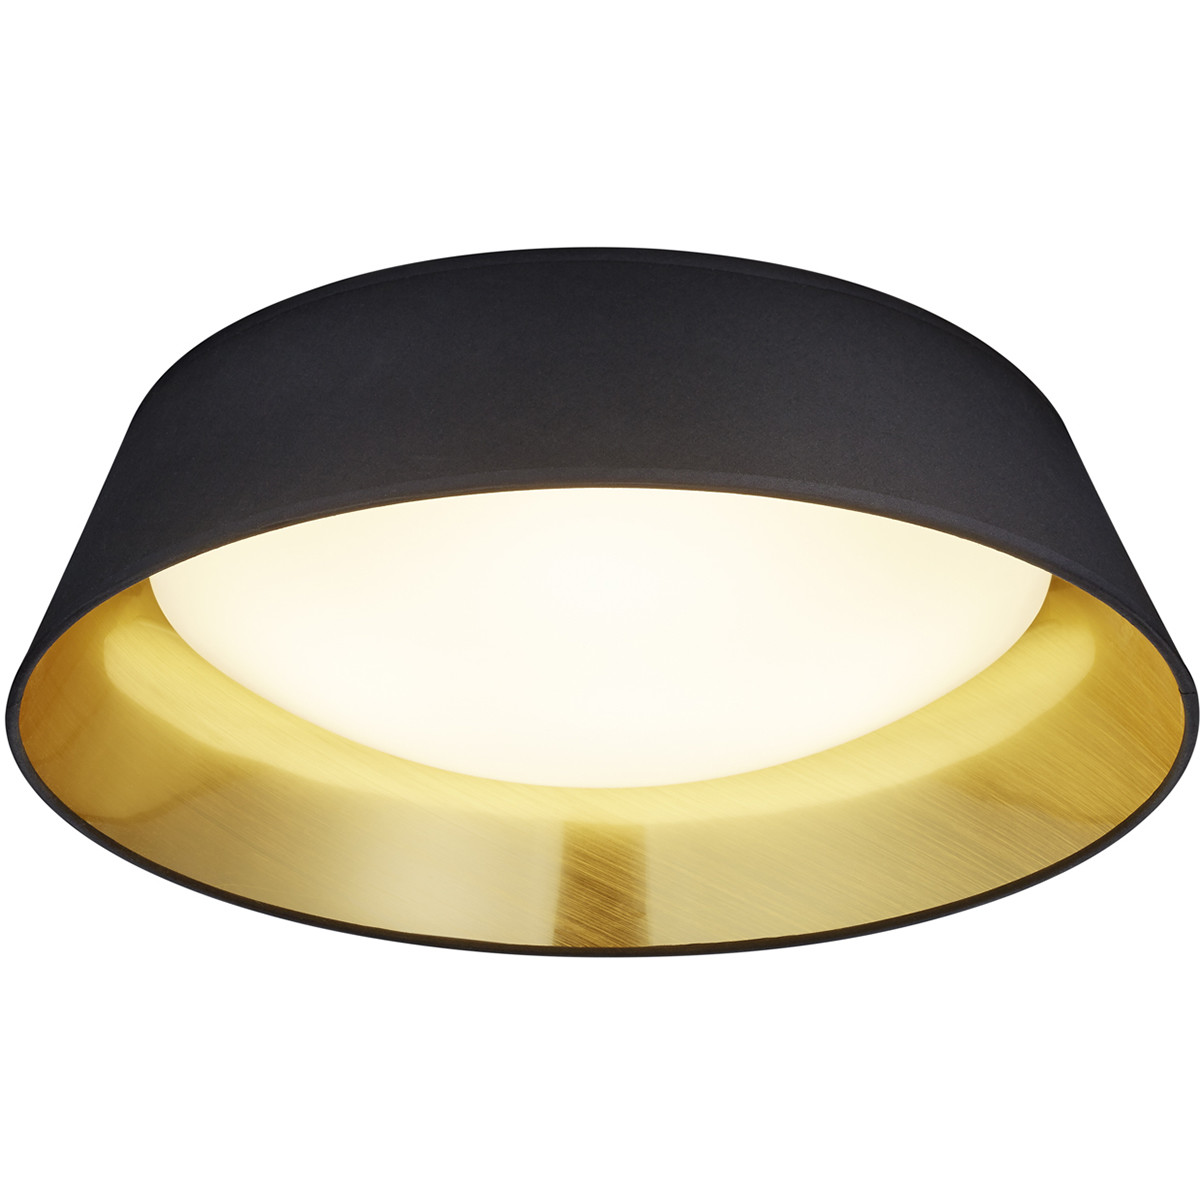 LED Plafondlamp - Plafondverlichting - Trion Pinton - 18W - Warm Wit 3000K - Rond - Mat Zwart - Text